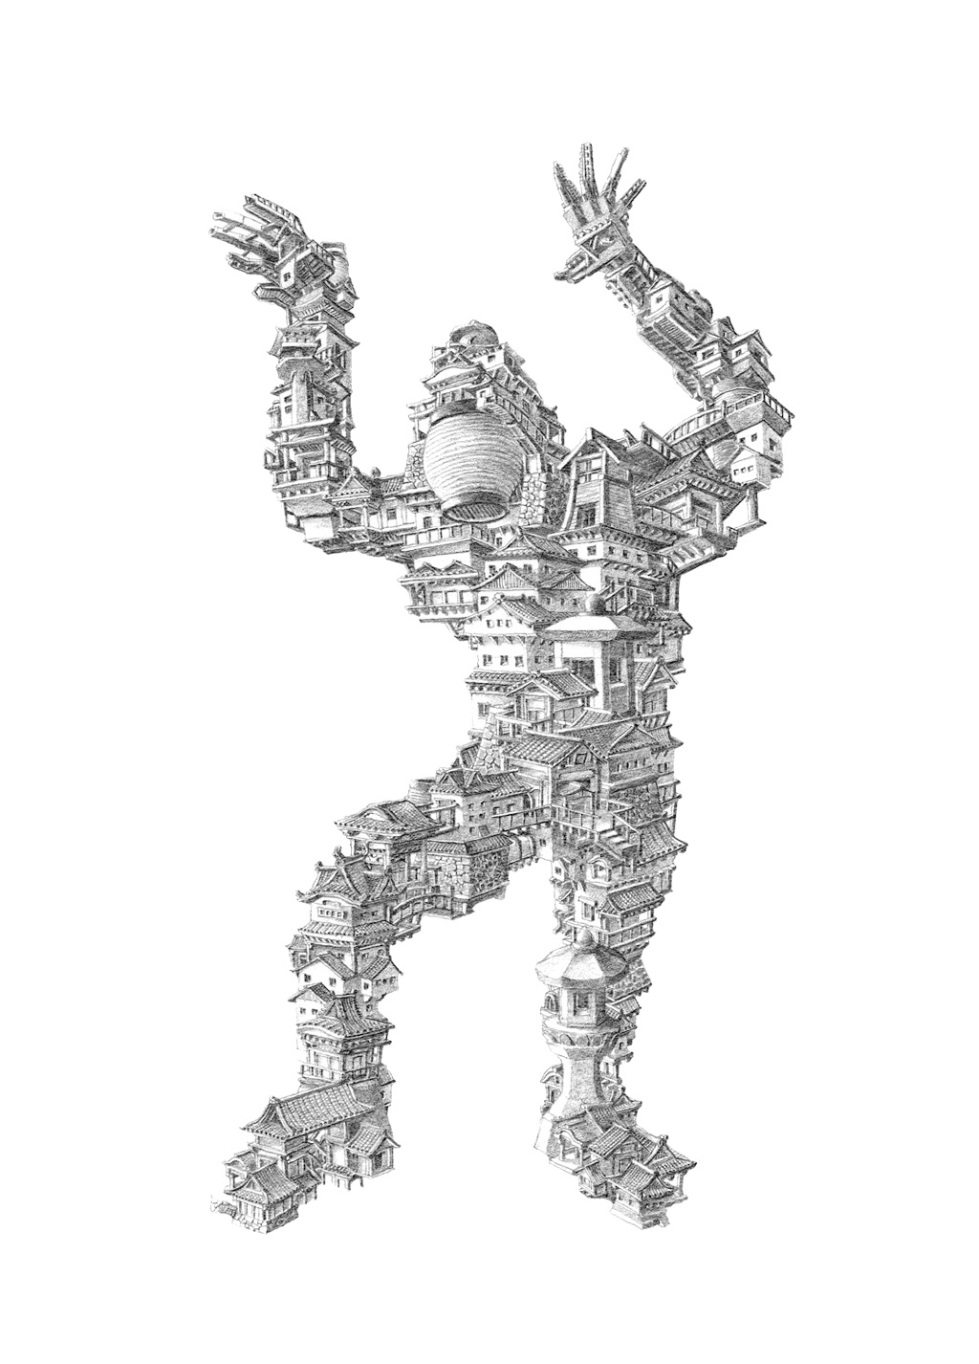 Guardian Miniature by Sean Edward